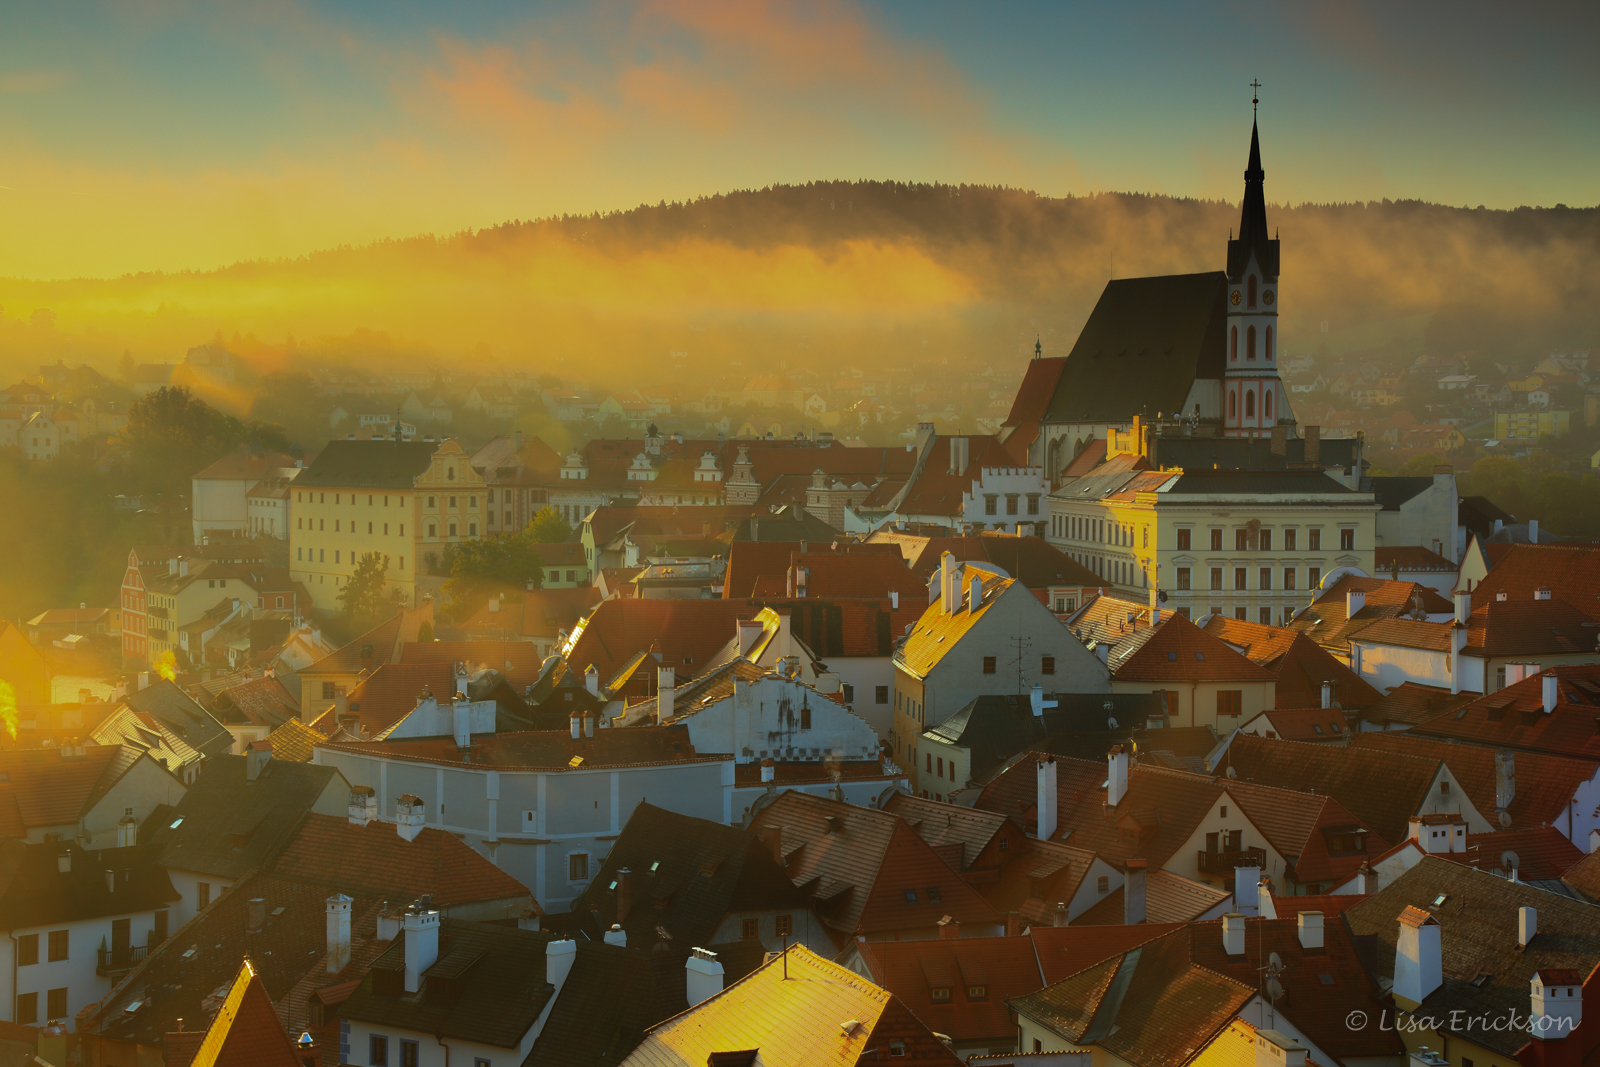 Overlook of city at sunrise, Czech Republic